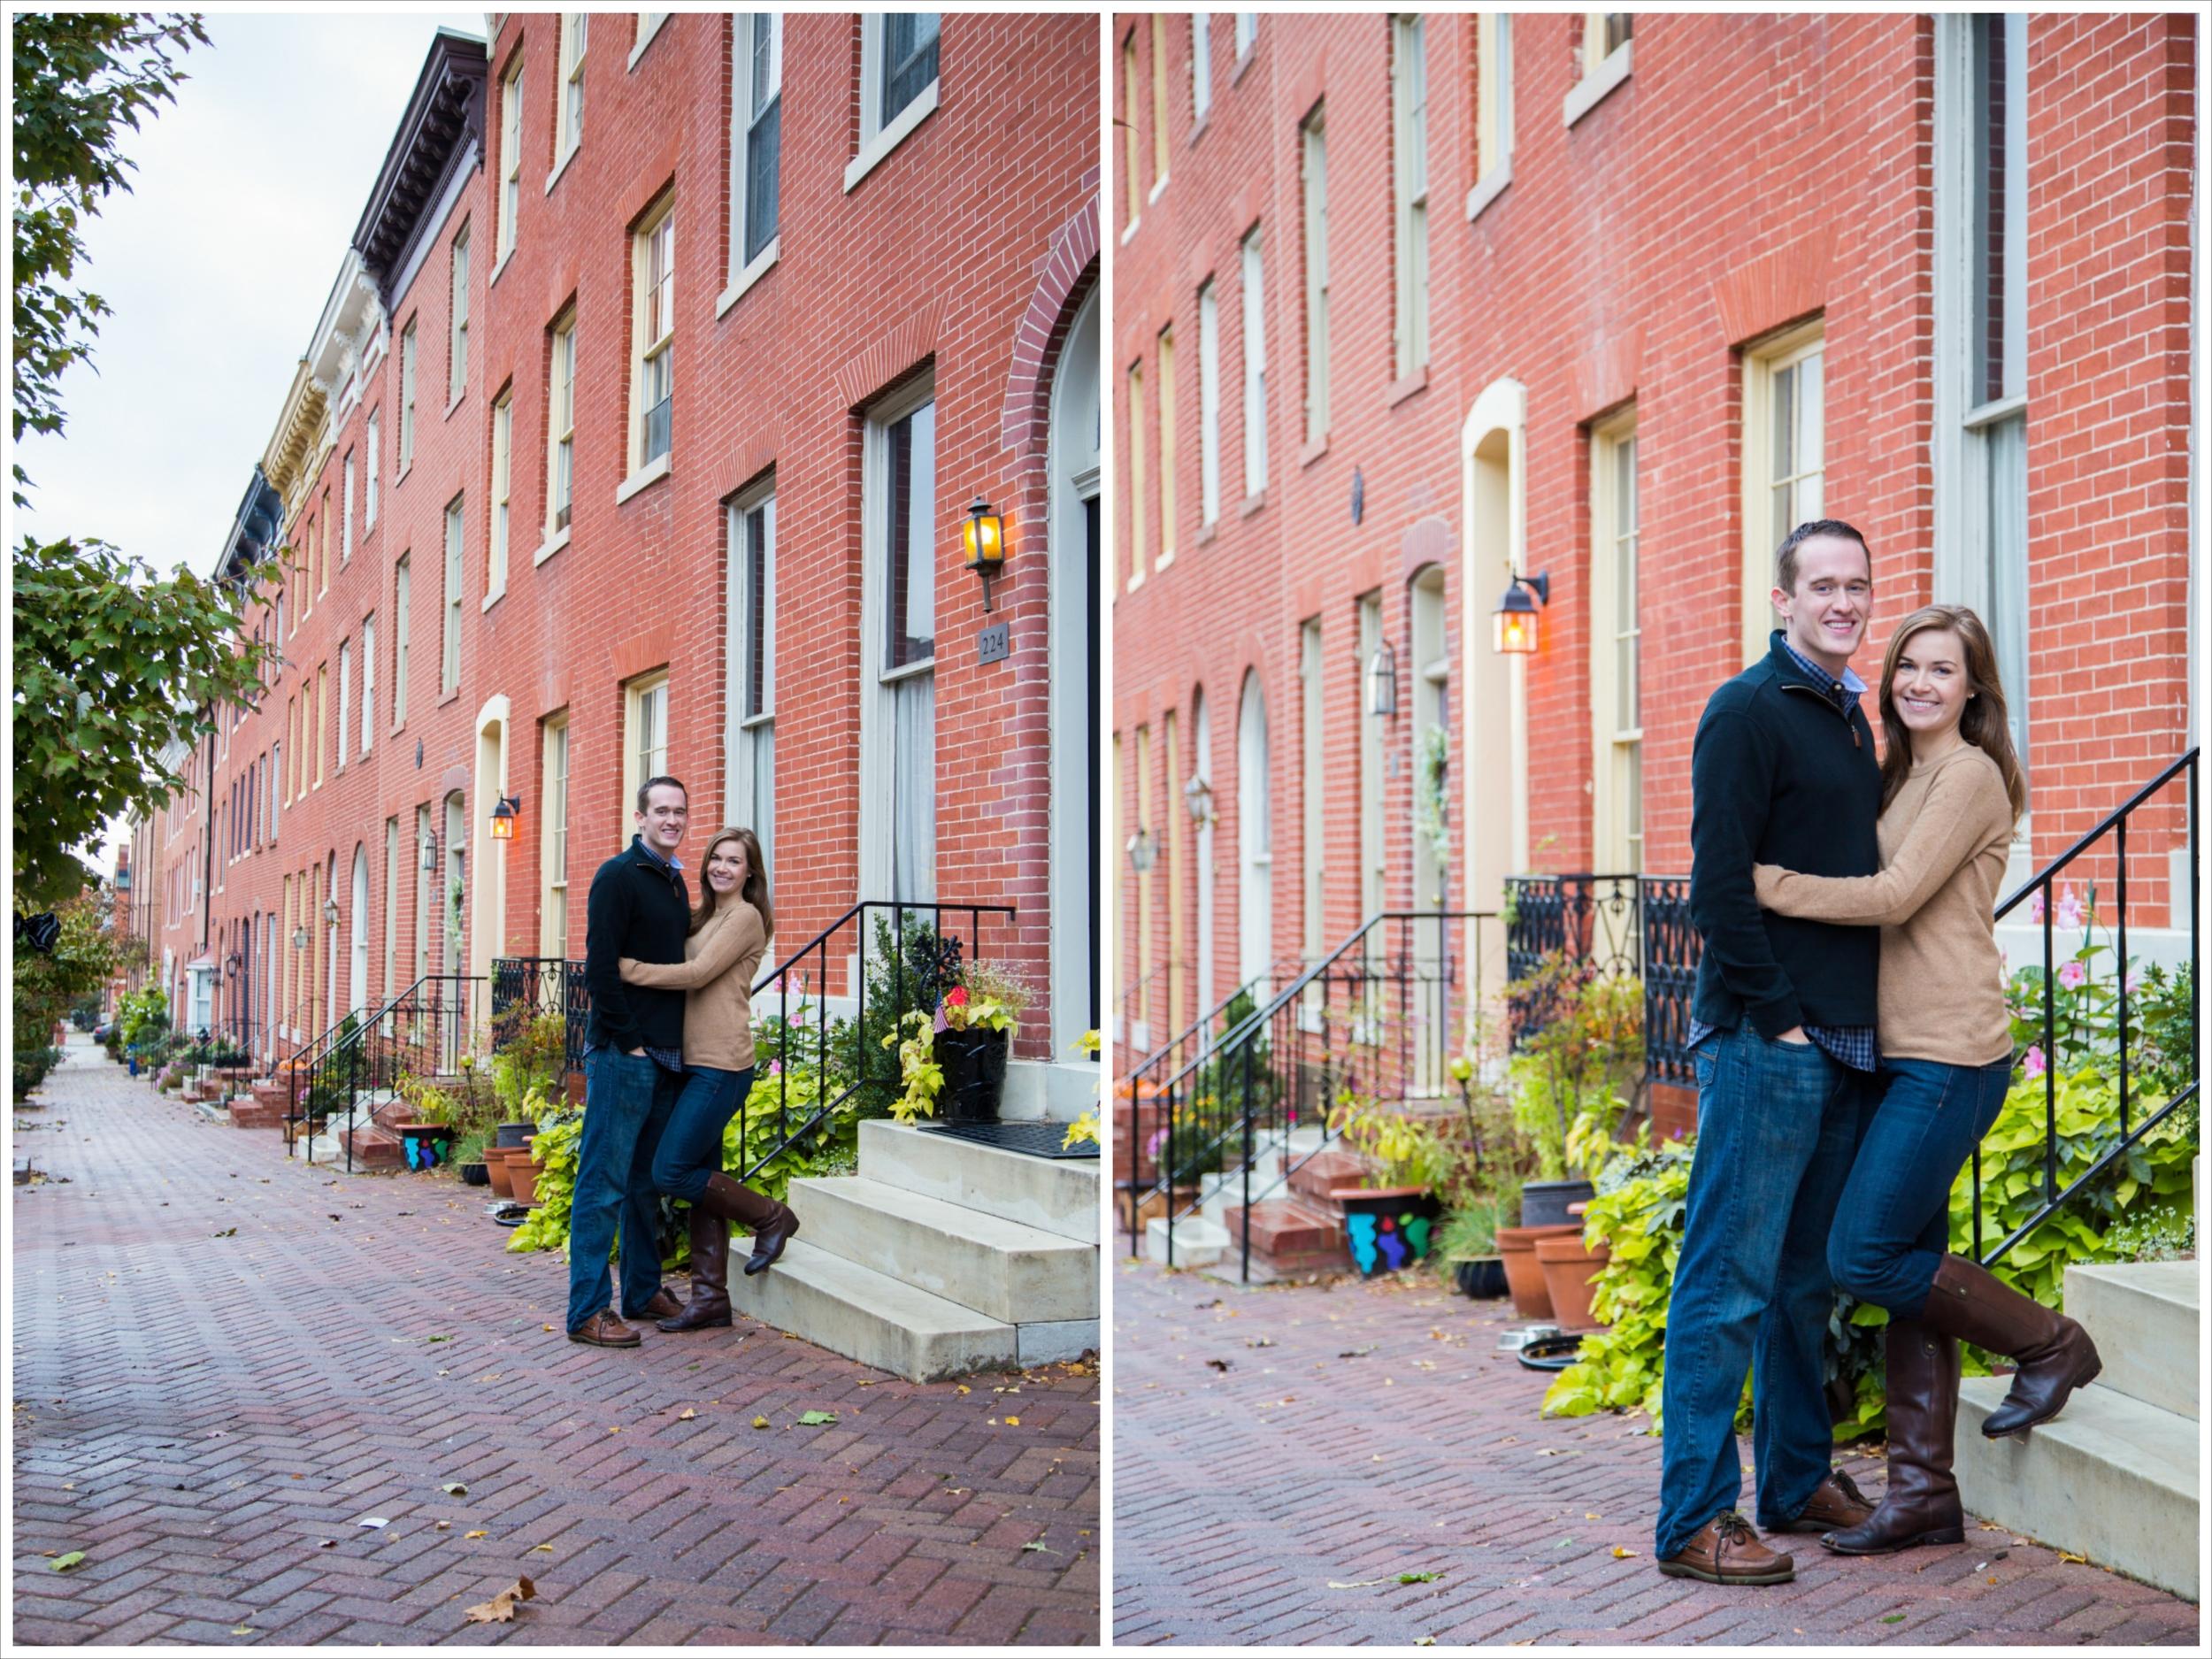 Garrett&Christine-2763_Fotor_Collage.jpg